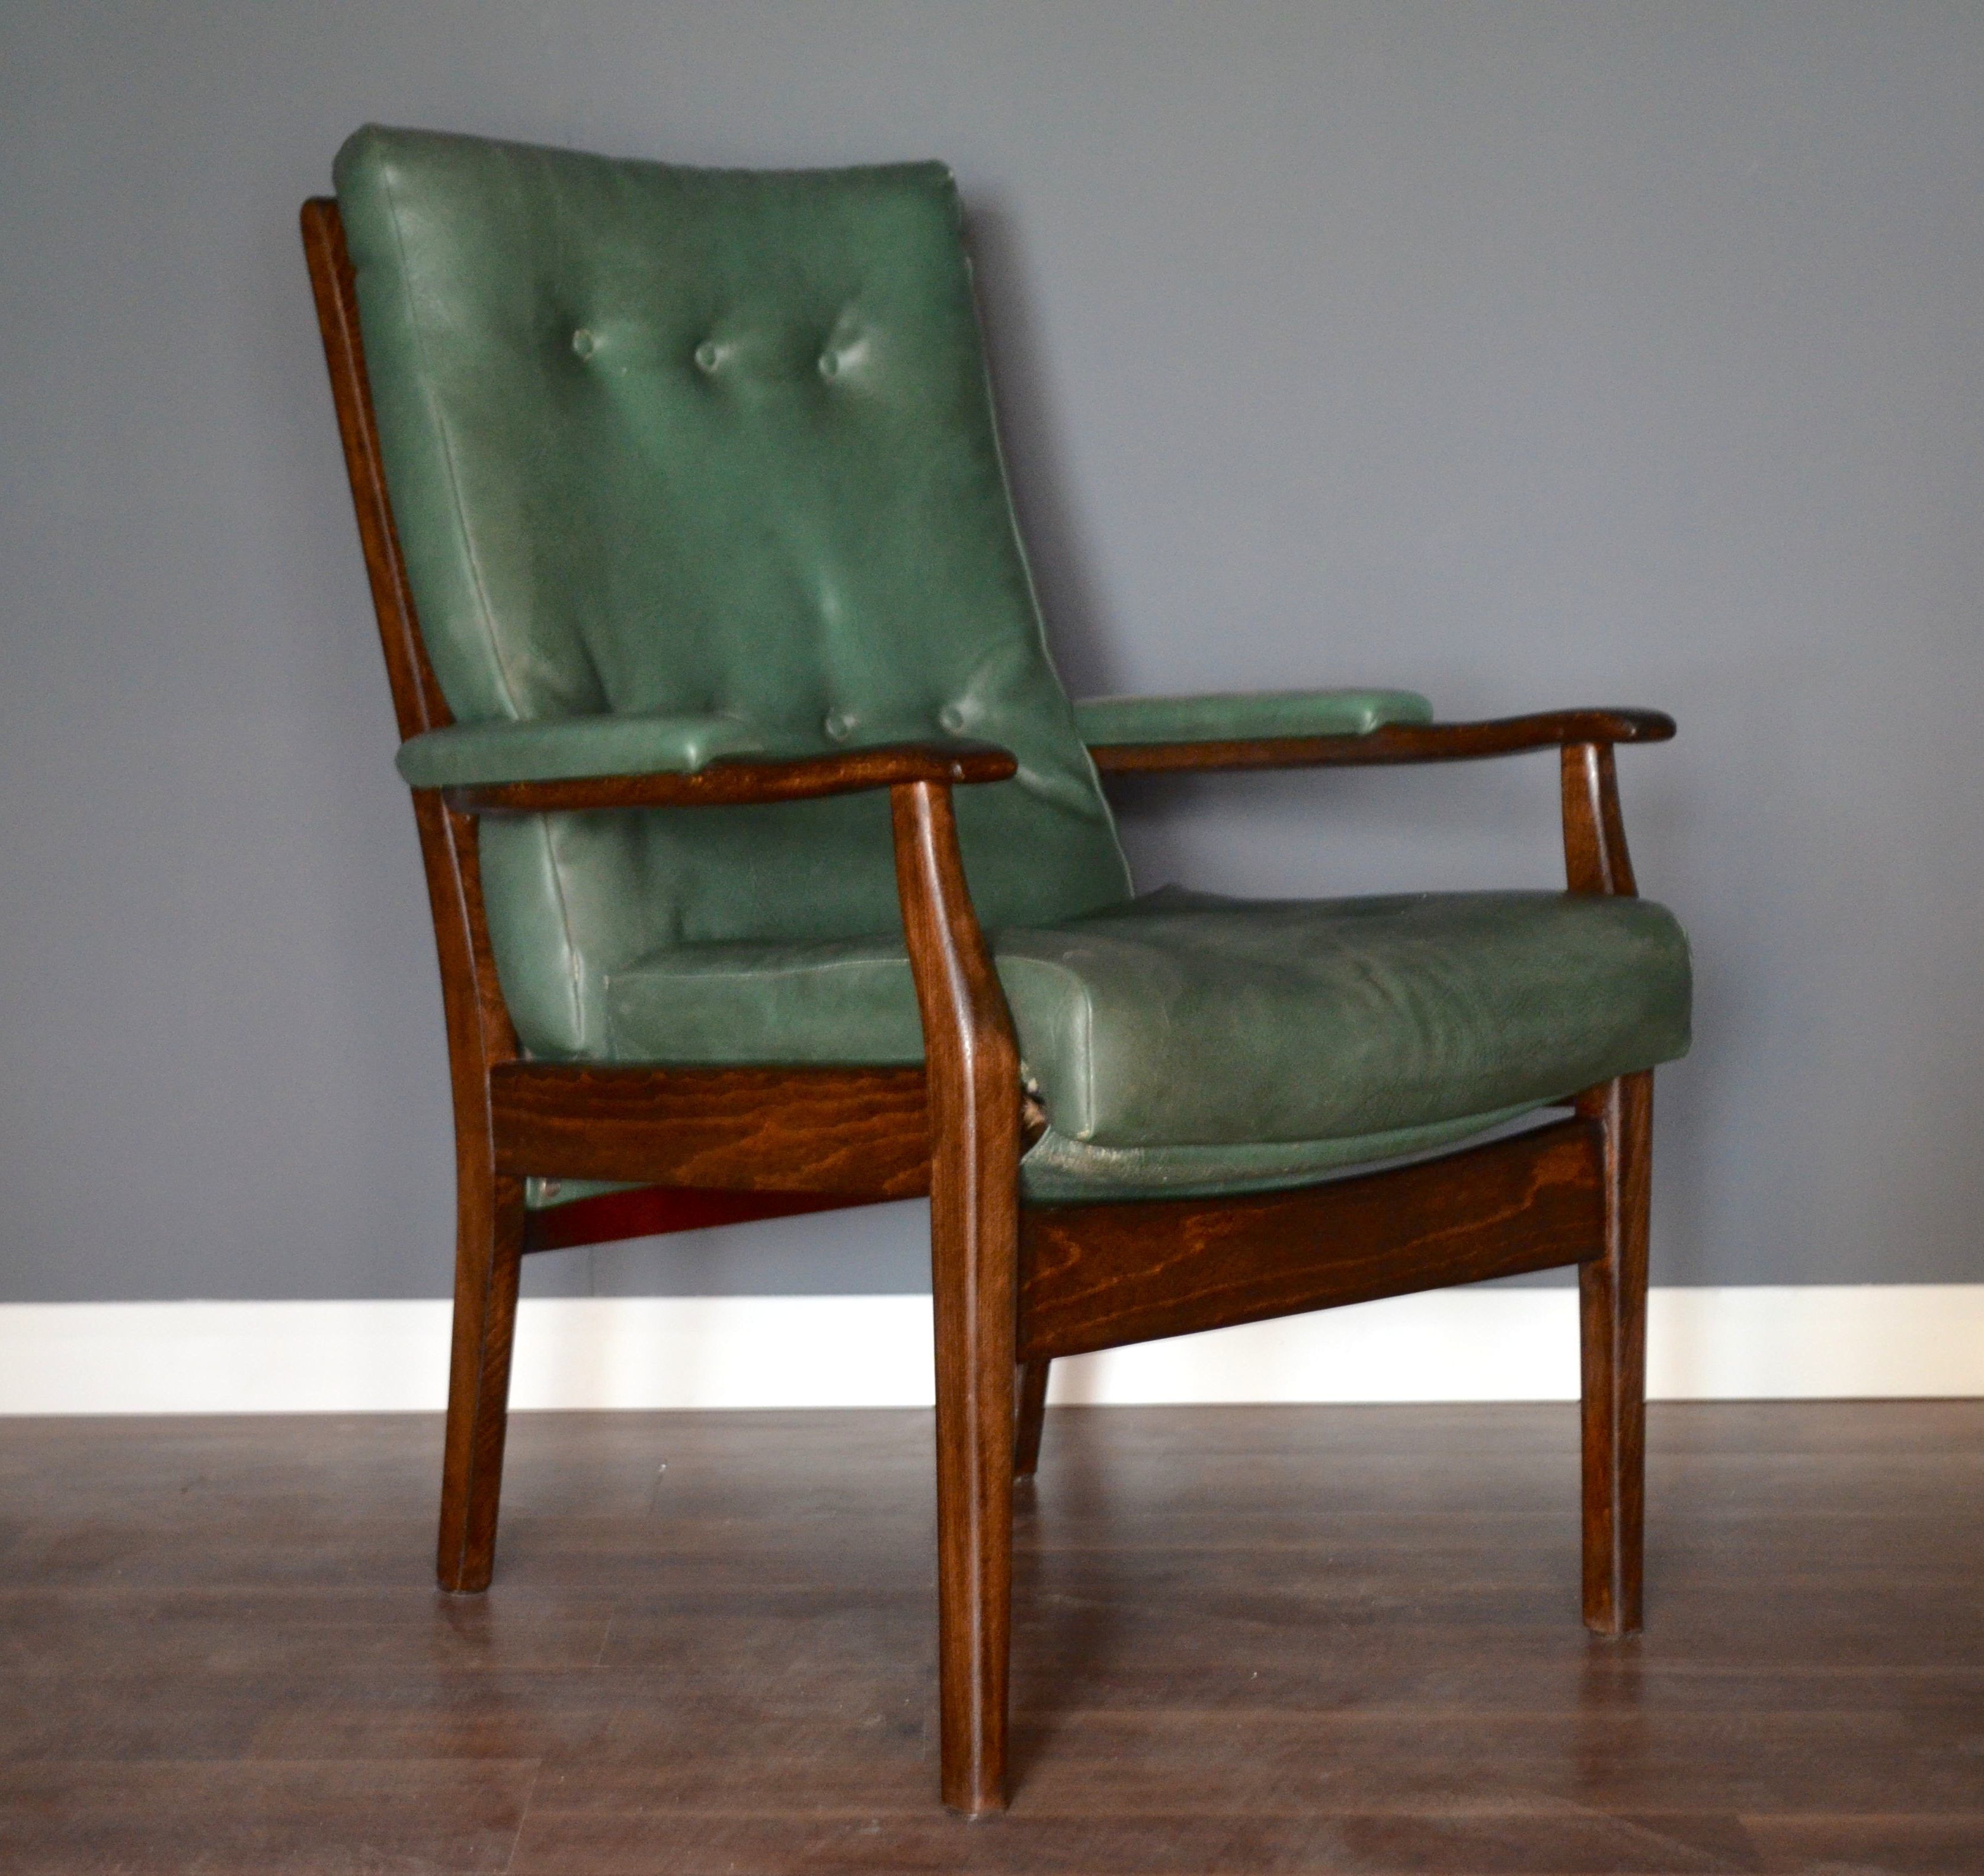 Stylish Vintage Danish Style Walnut And Leather Armchair Modern Midcentury Scandinav Leather Armchair Leather Armchair Modern Scandinavian Style Armchairs